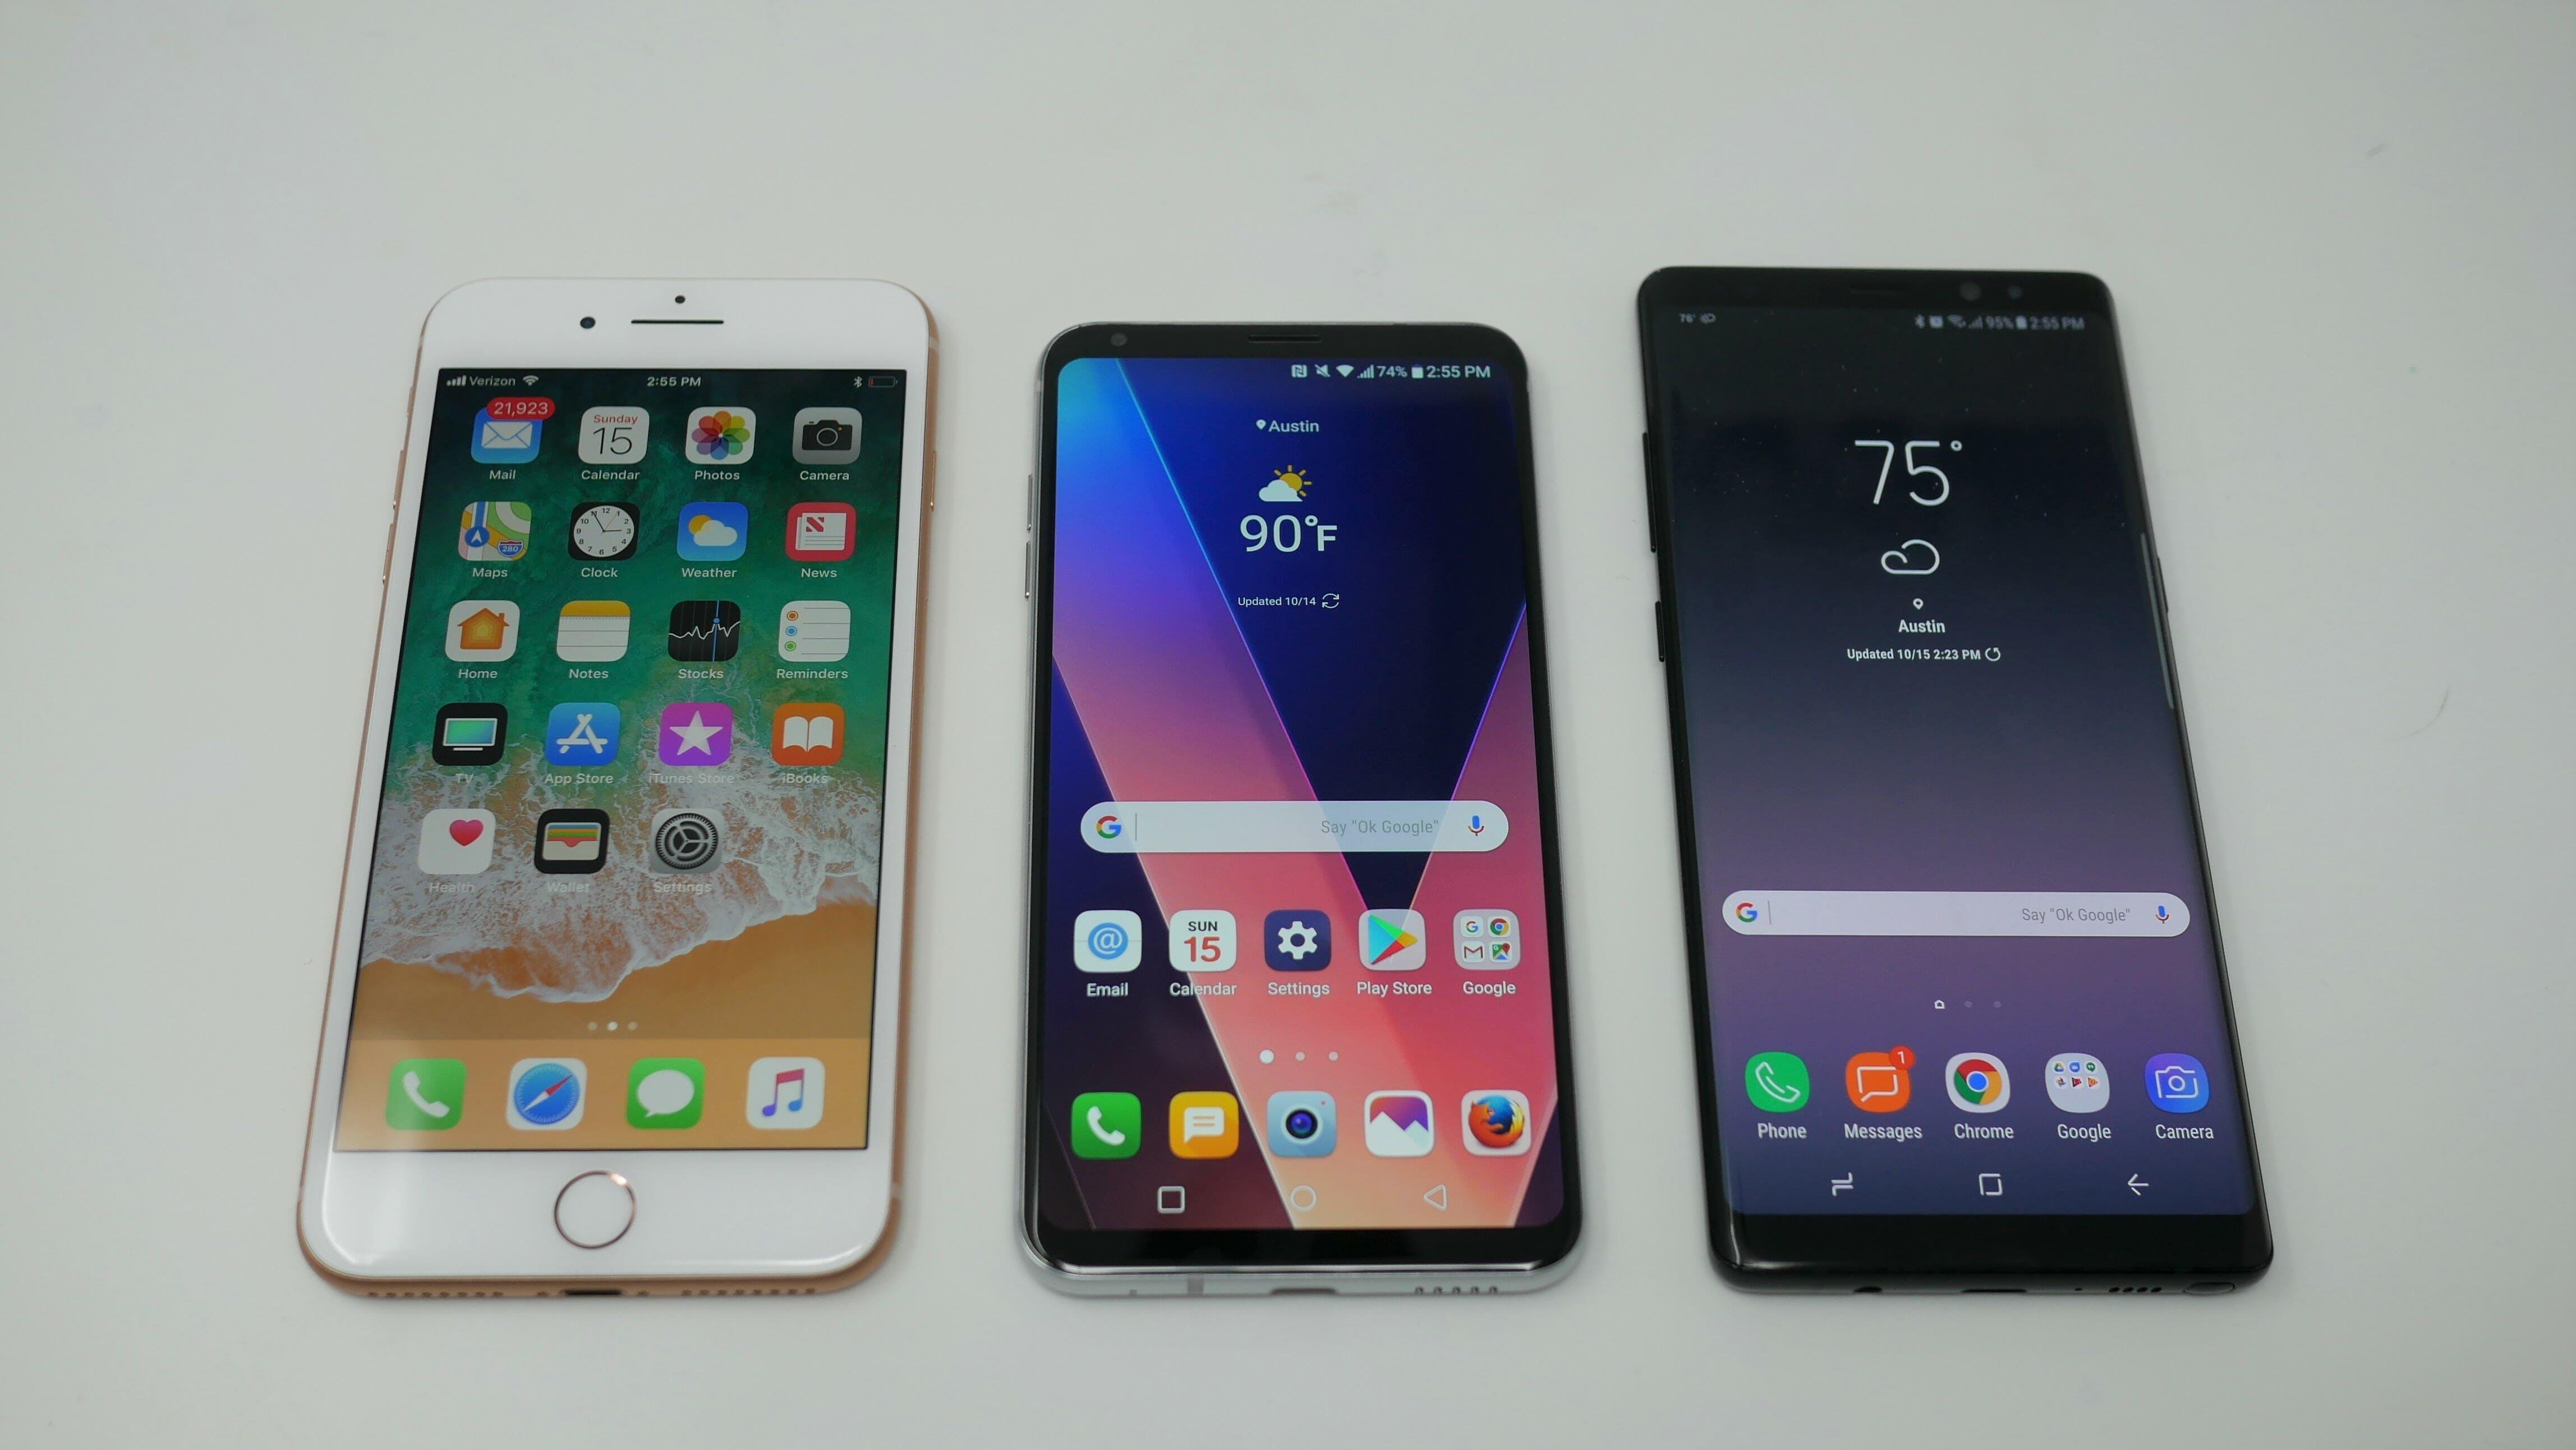 lg v30, iphone 8 plus, galaxy note 8